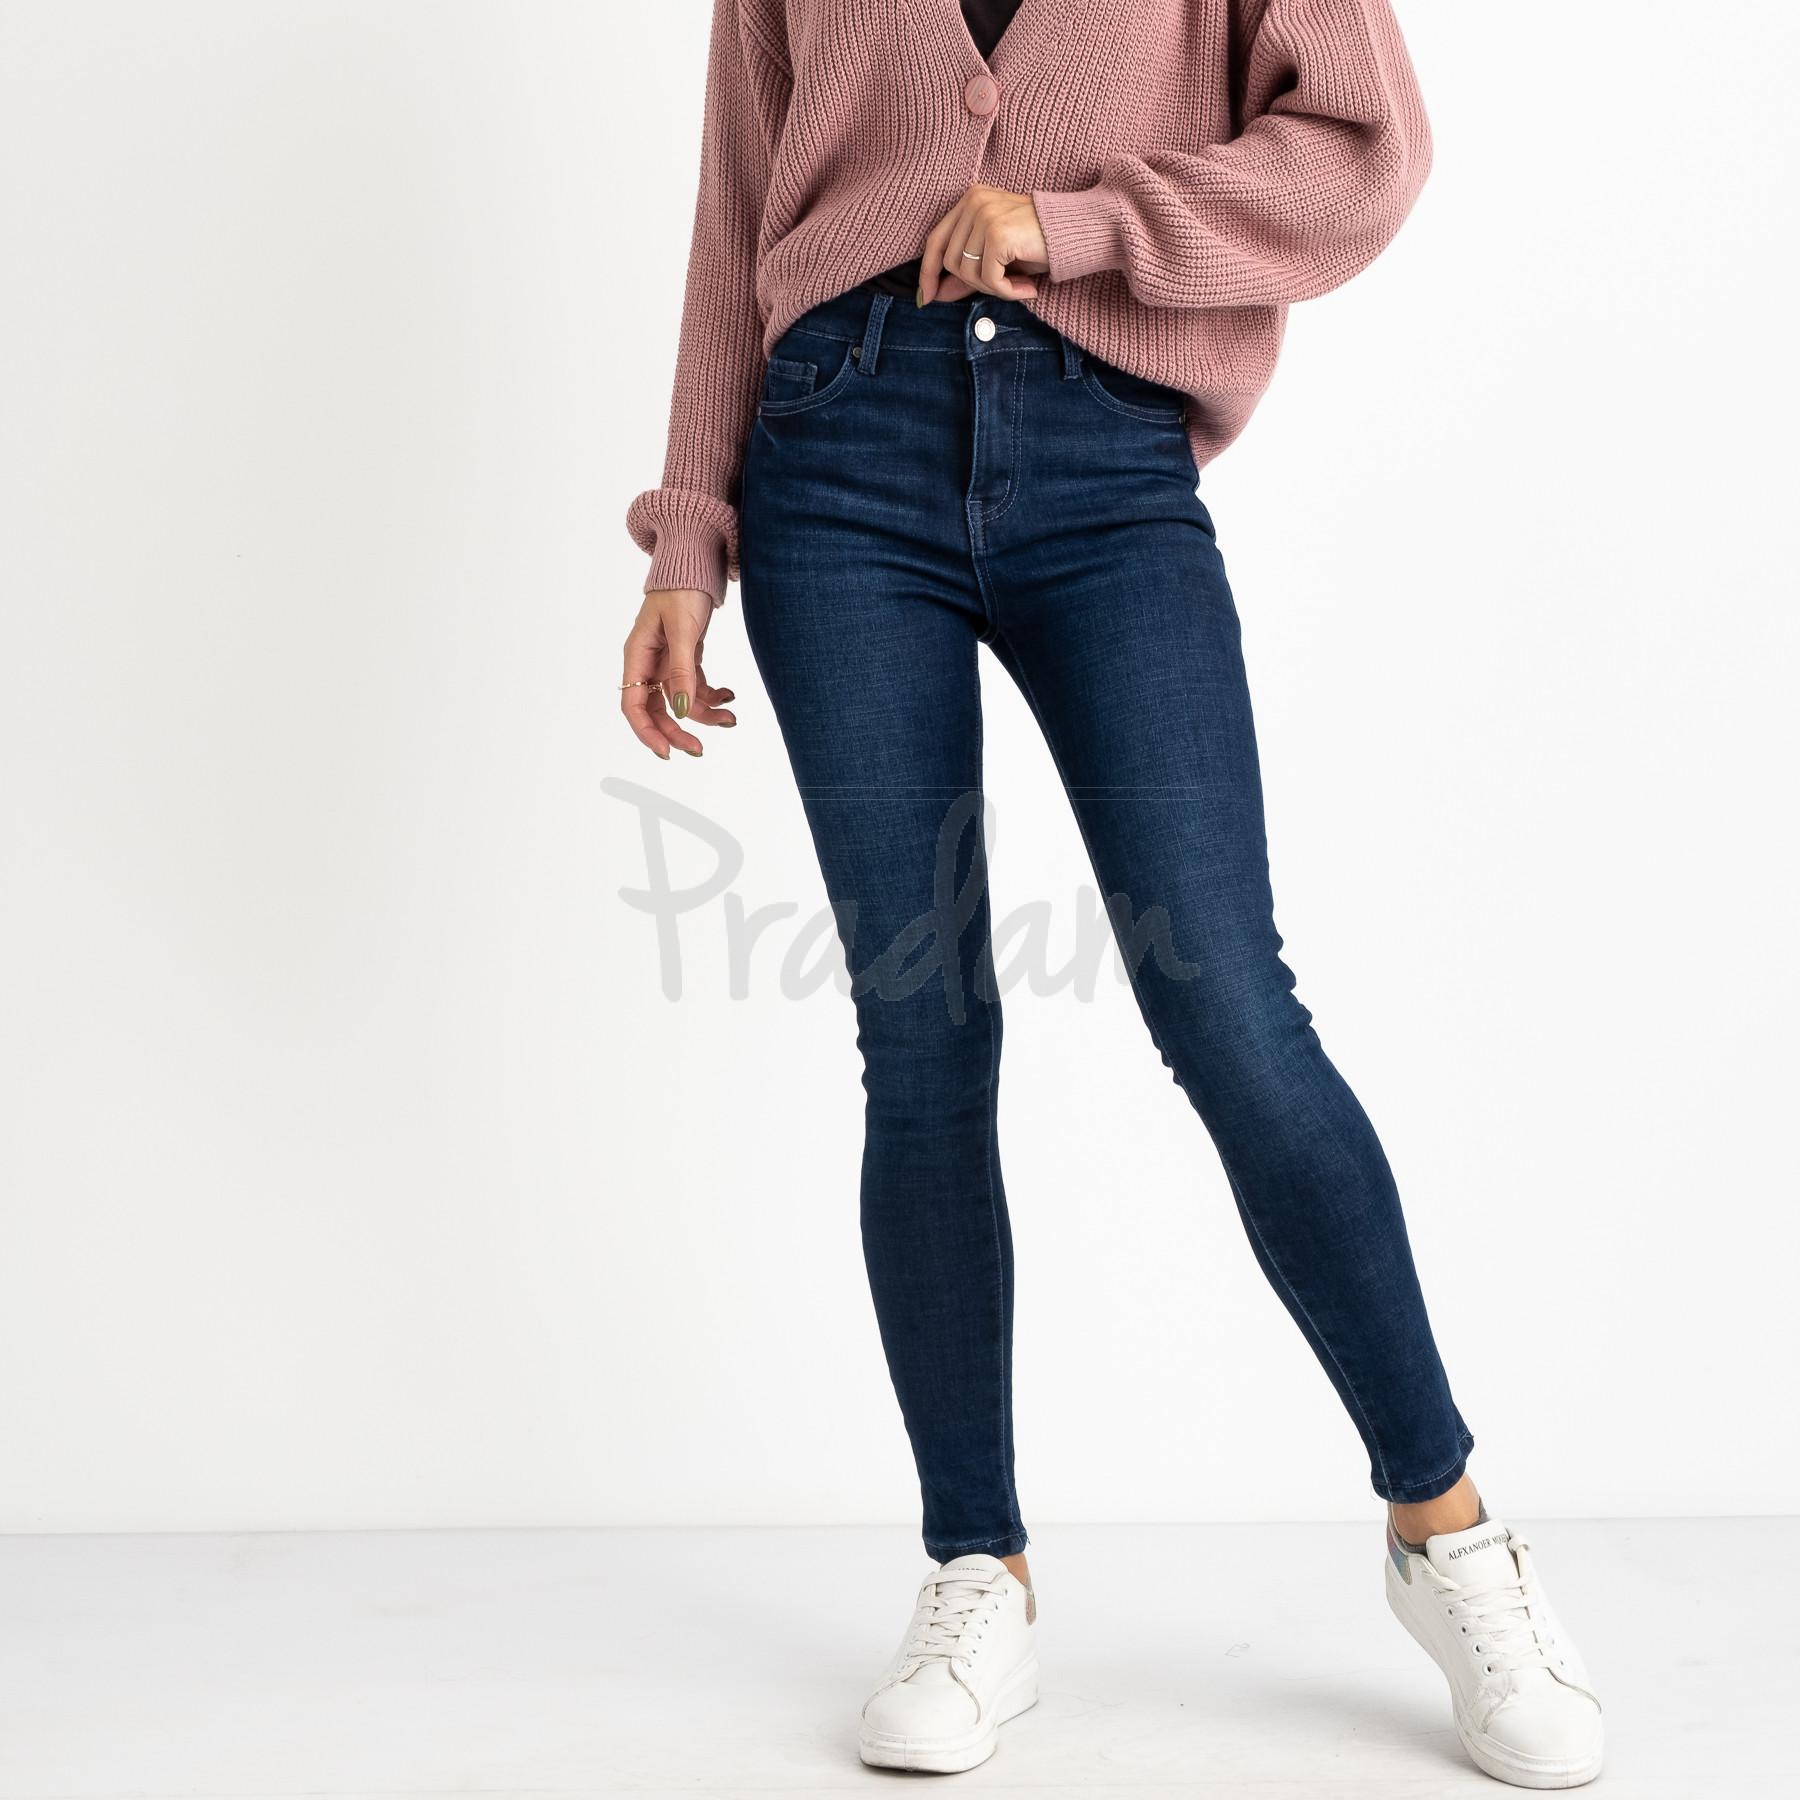 6020 New Jeans американка на флисе синяя стрейчевая (6 ед.размеры: 25.26.27.28.29.30)